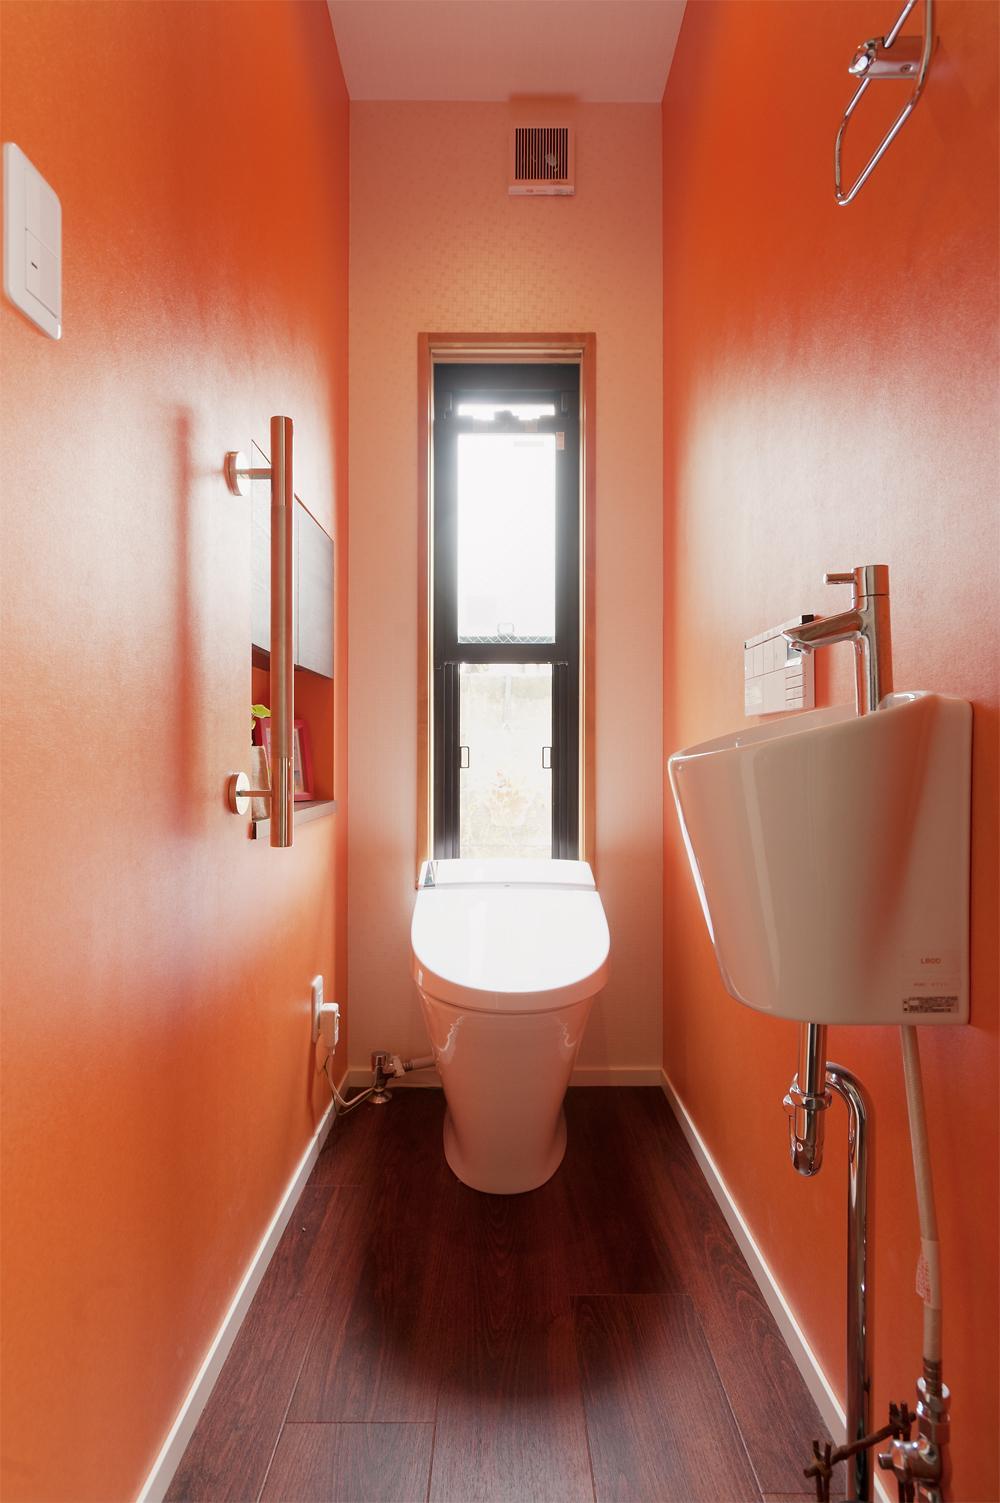 S邸・家族の笑顔がつながるオープンキッチンの部屋 オレンジ壁のトイレ